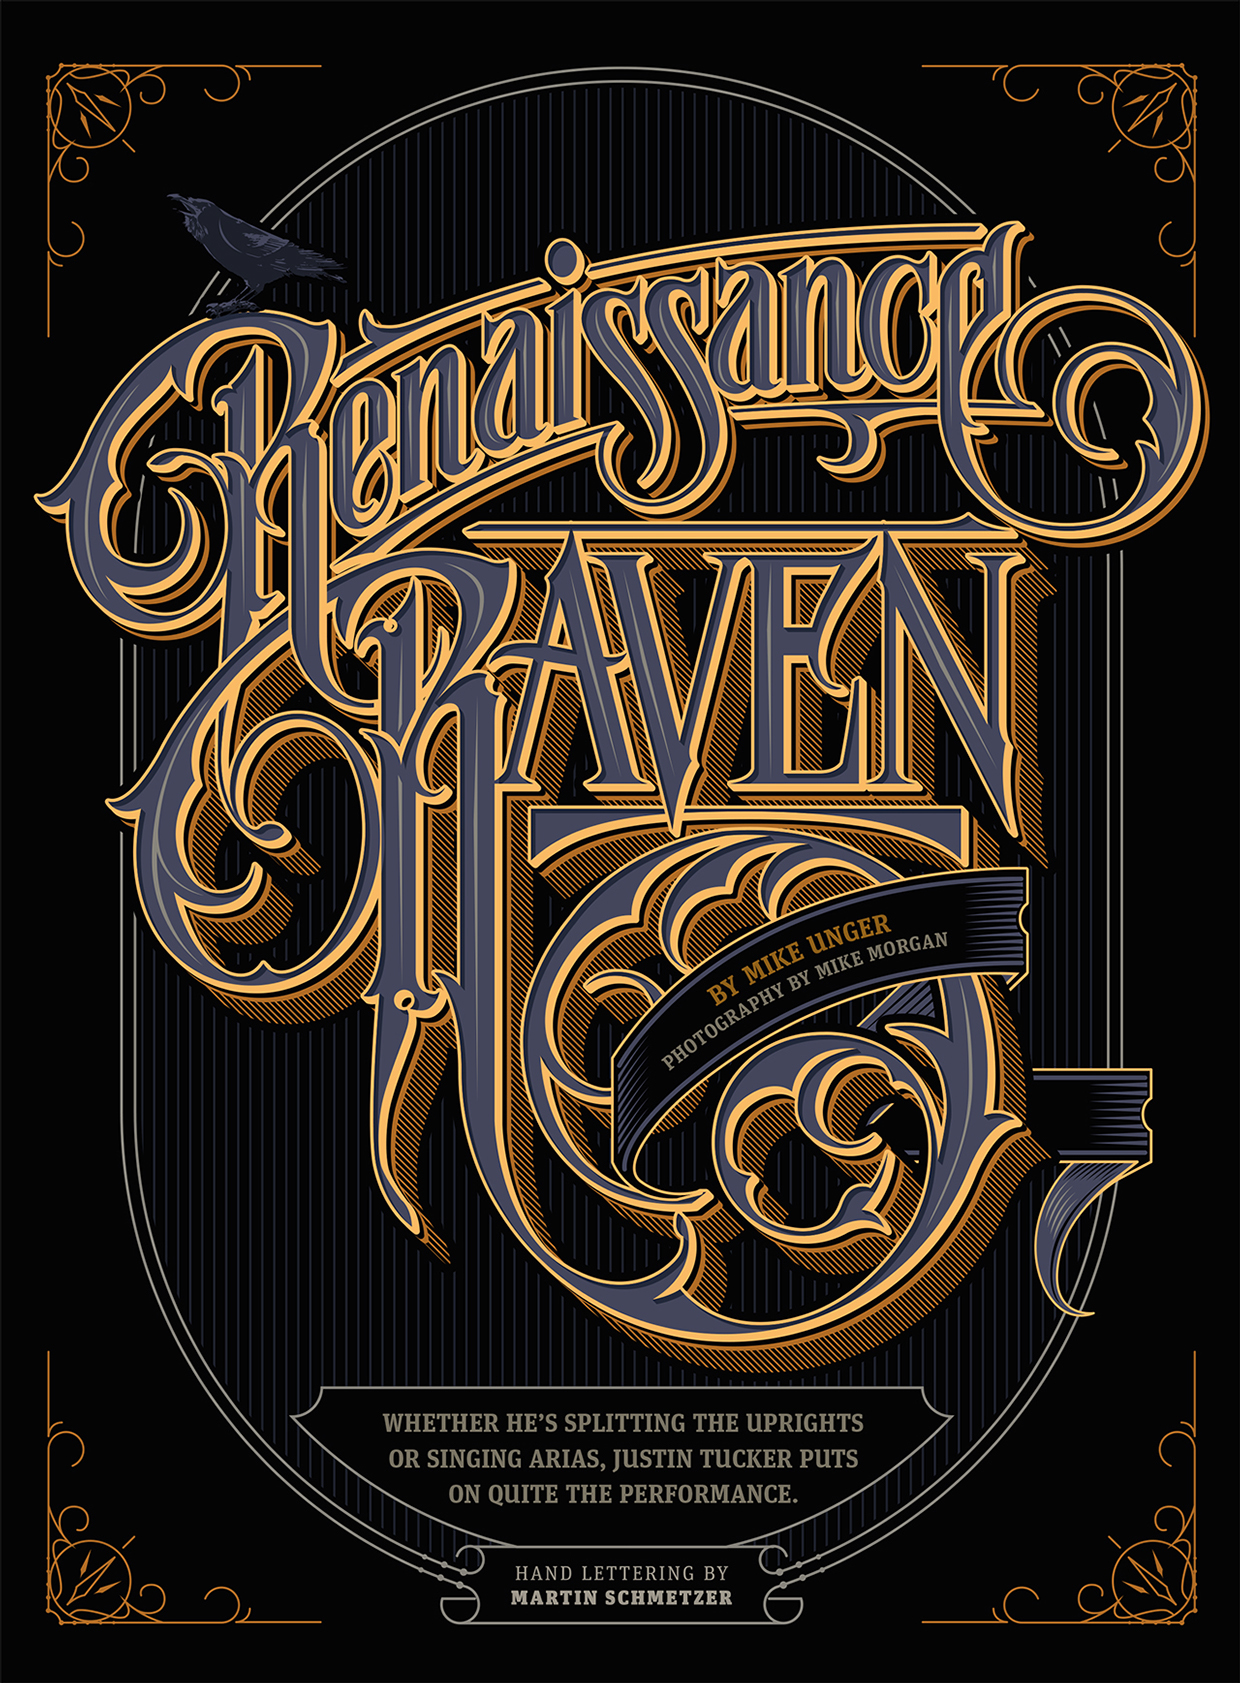 Martin Schmetzer logotypes lettering 15